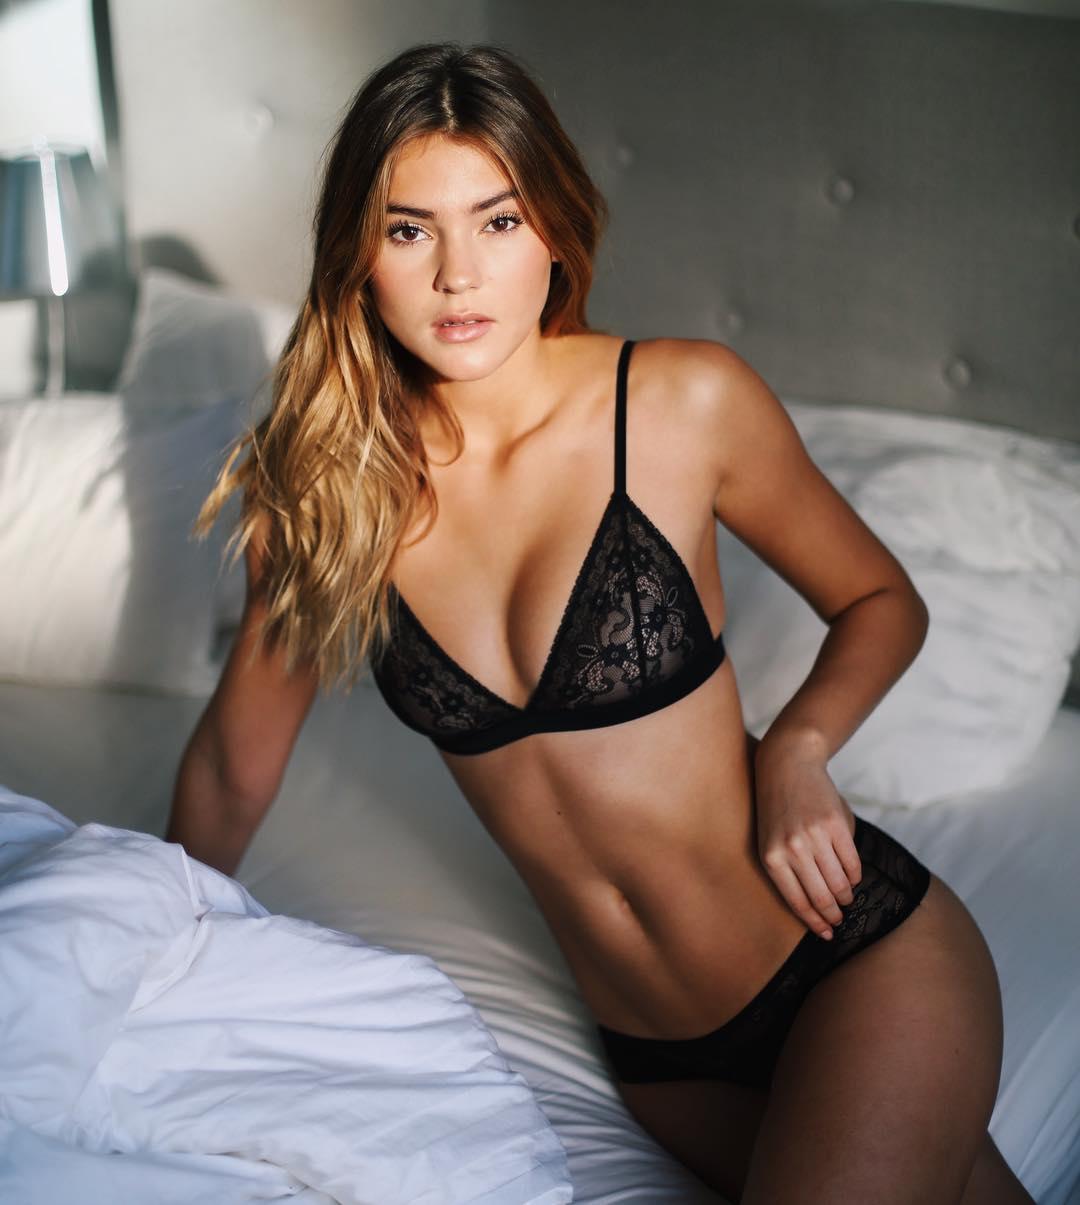 Bikini Stefanie Giesinger nude (49 photos), Twitter